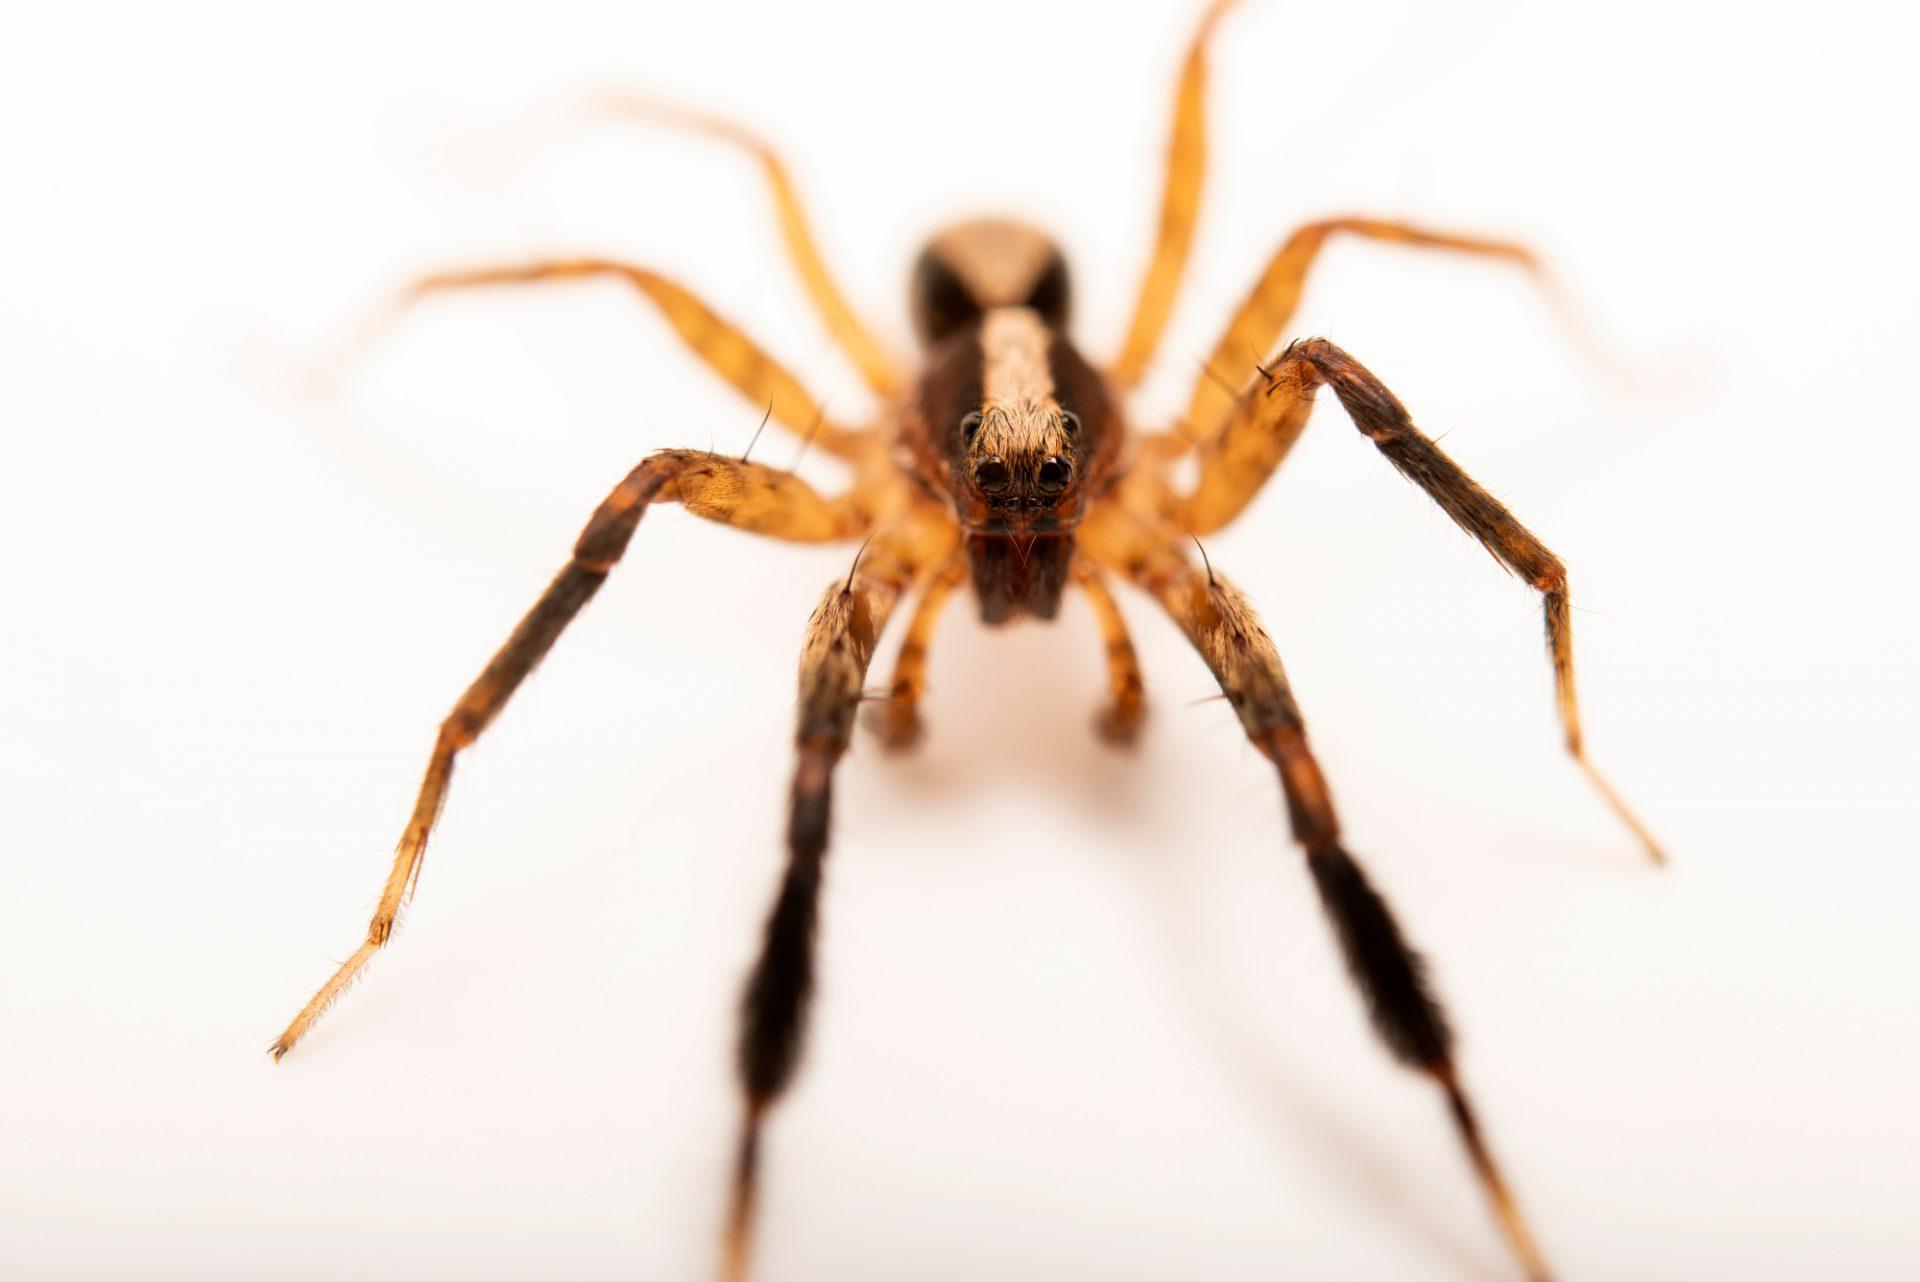 Photo: A male wolf spider (Schizocosa crassipes) from the University of Nebraska-Lincoln.